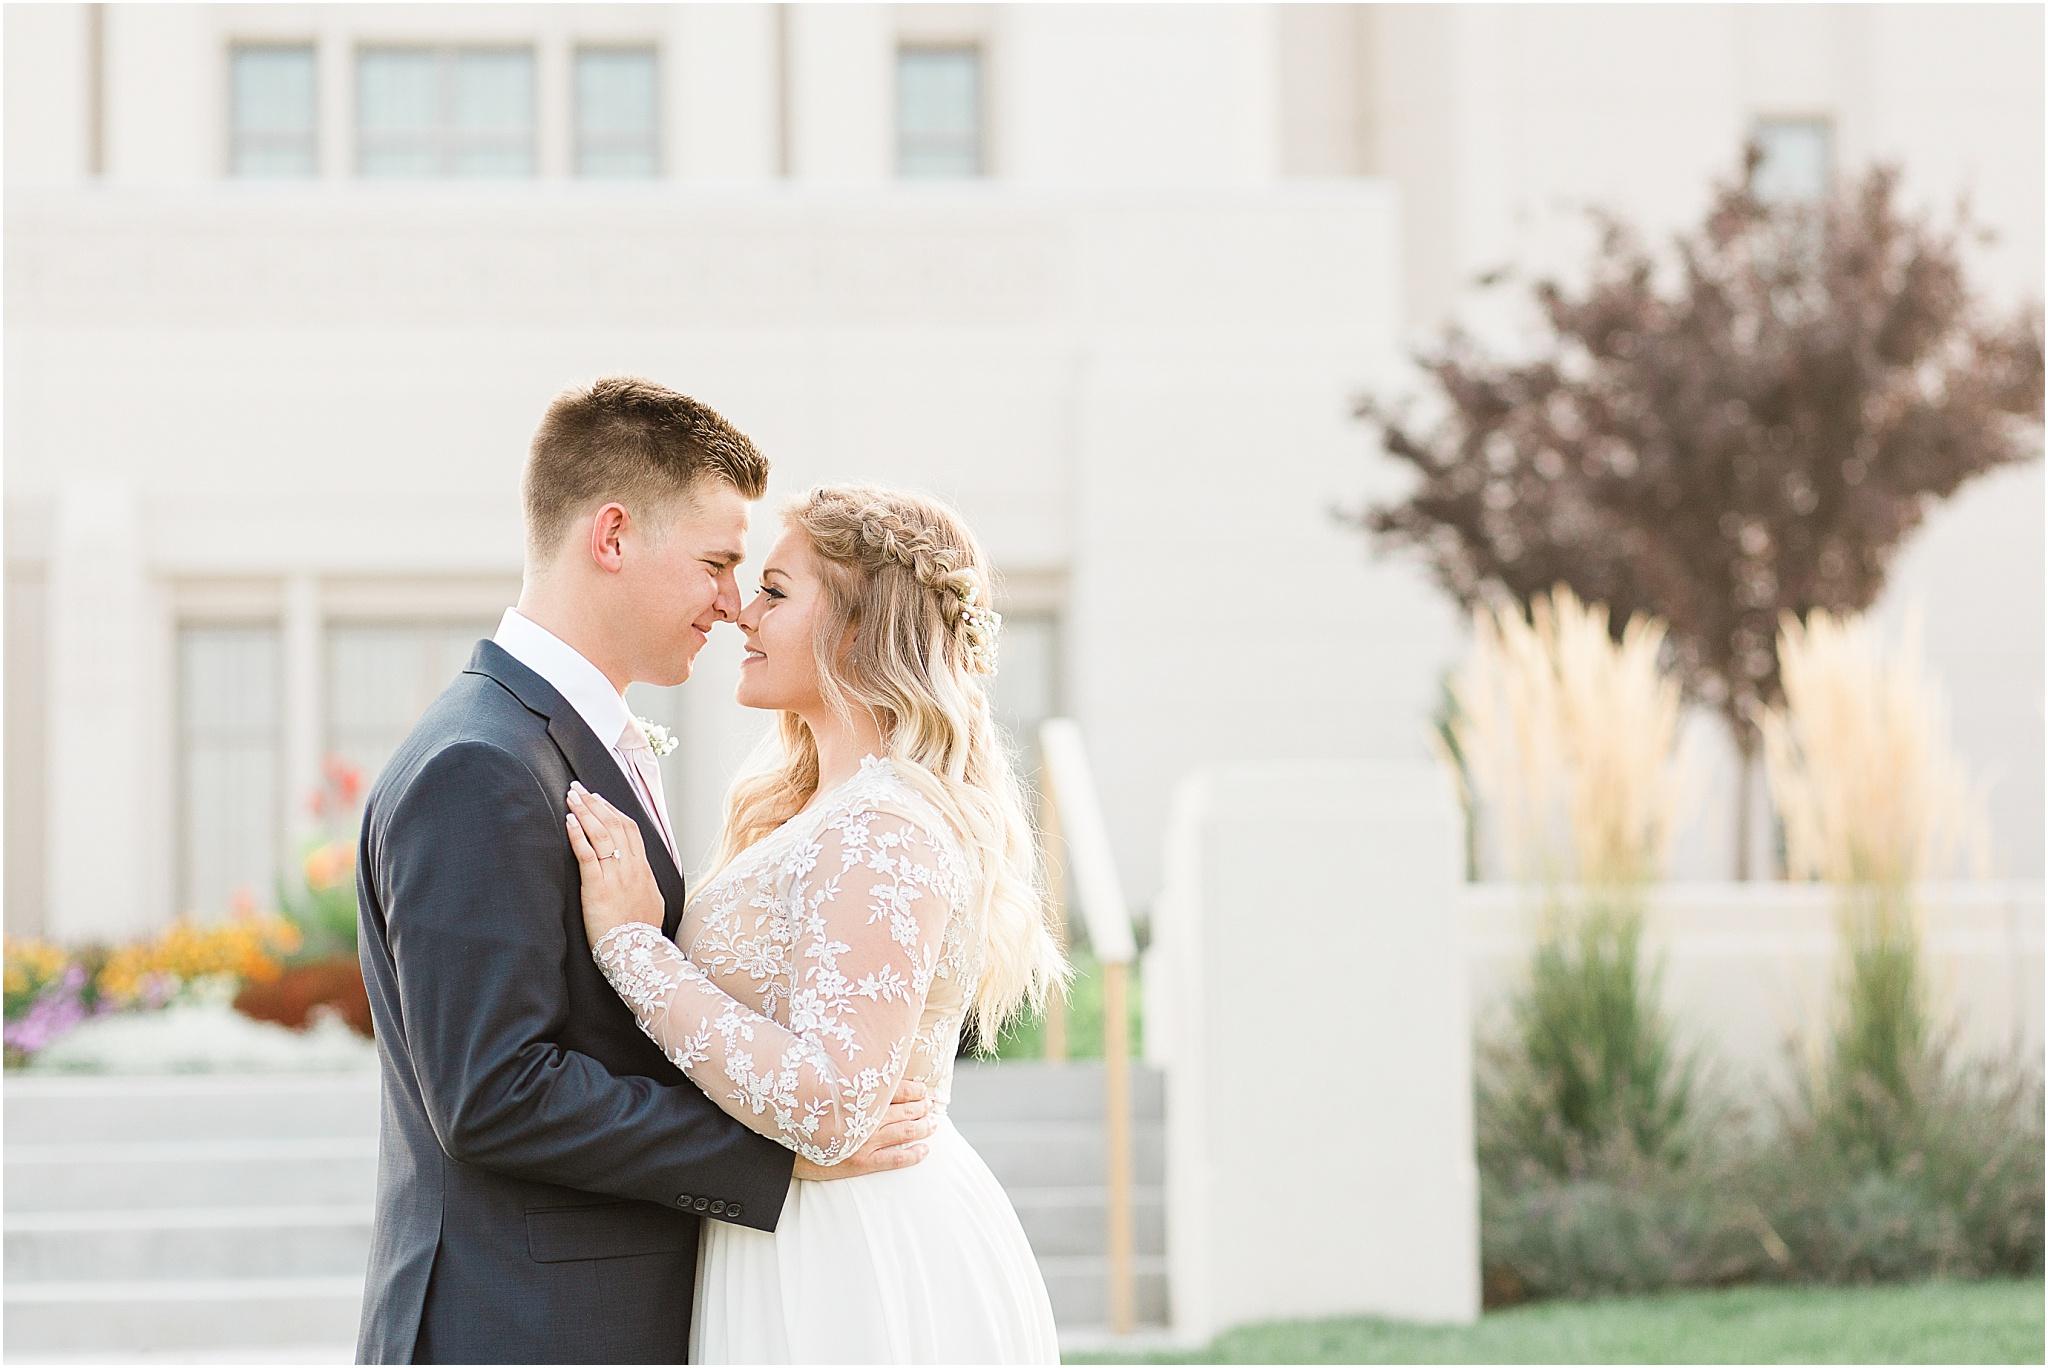 Wedding Photography_Meridian Idaho Temple_Boise Idaho_Nampa Idaho_Leah Southwick Photography_0001.jpg